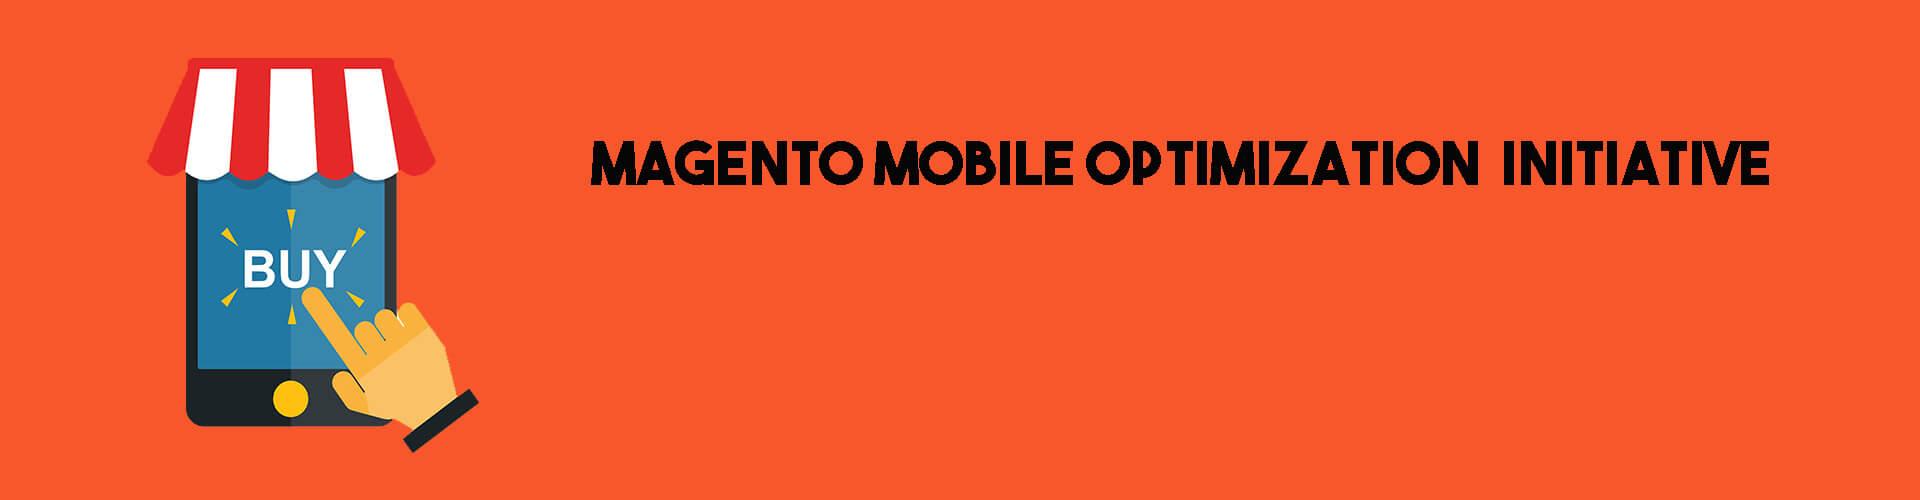 magento mobile optimization